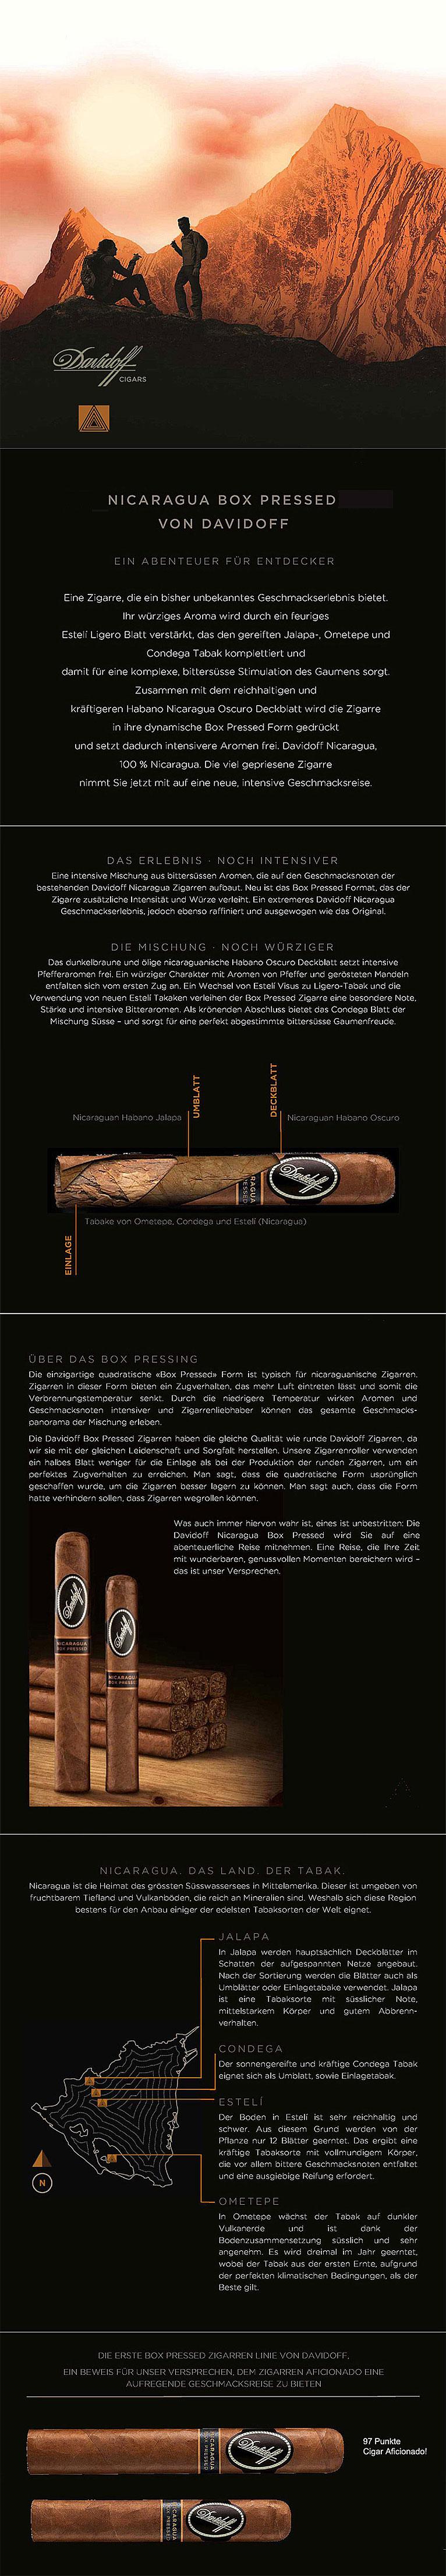 Davidoff Nicaragua Box Pressed Zigarren